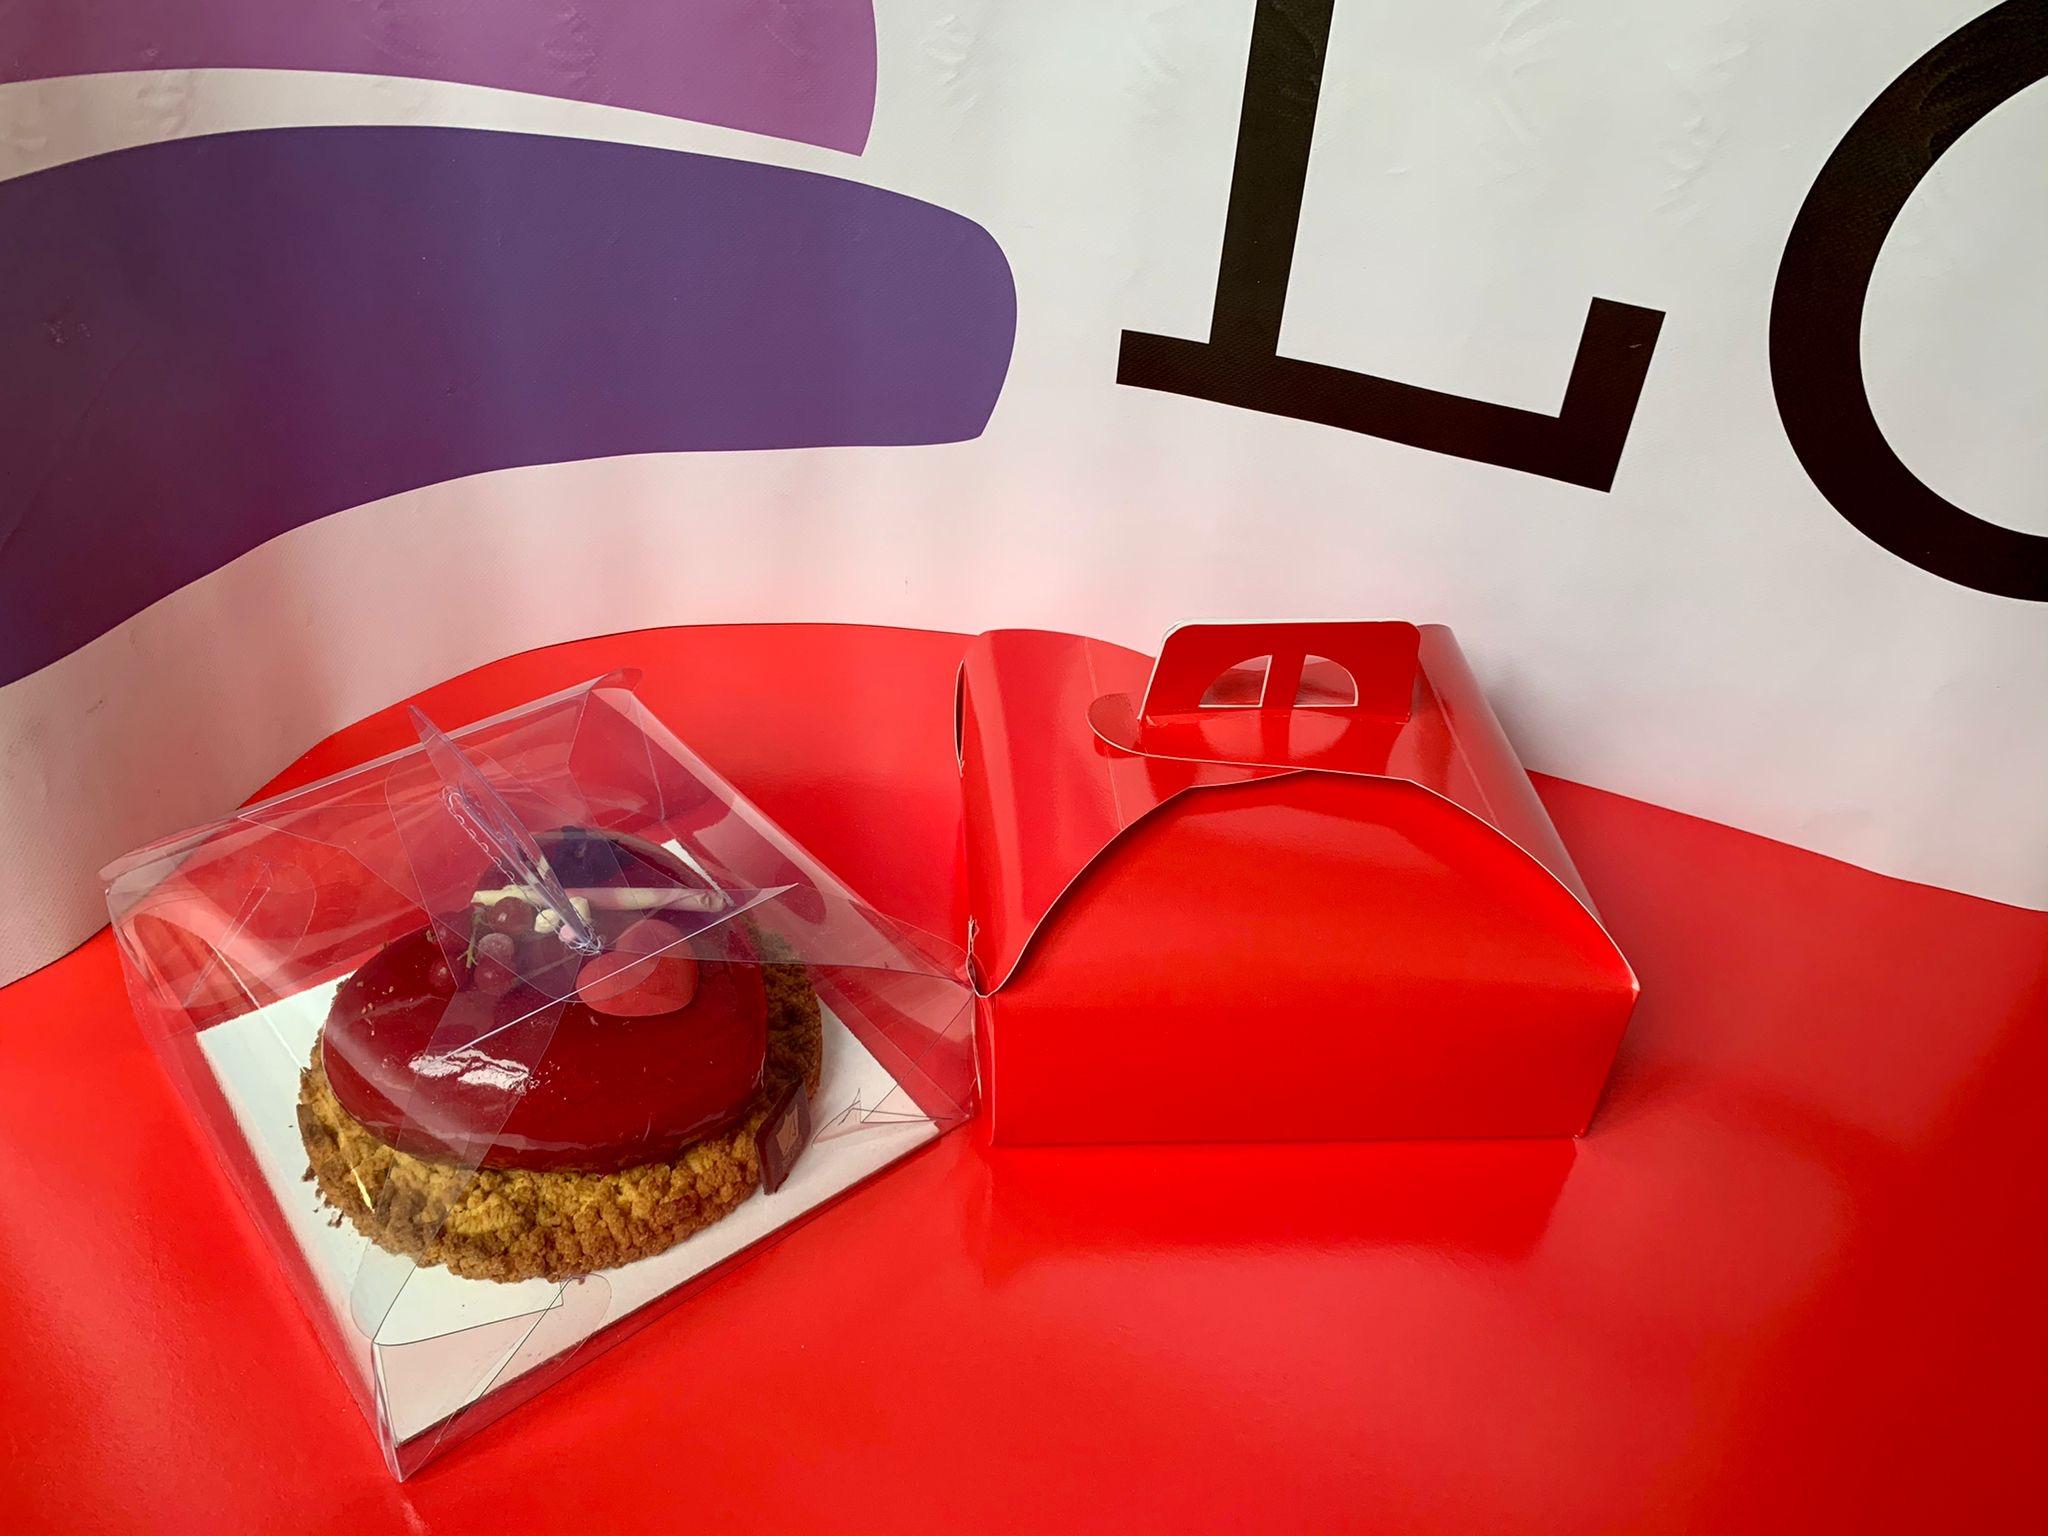 Quote societarie settore packaging alimentare  in vendita - foto 5